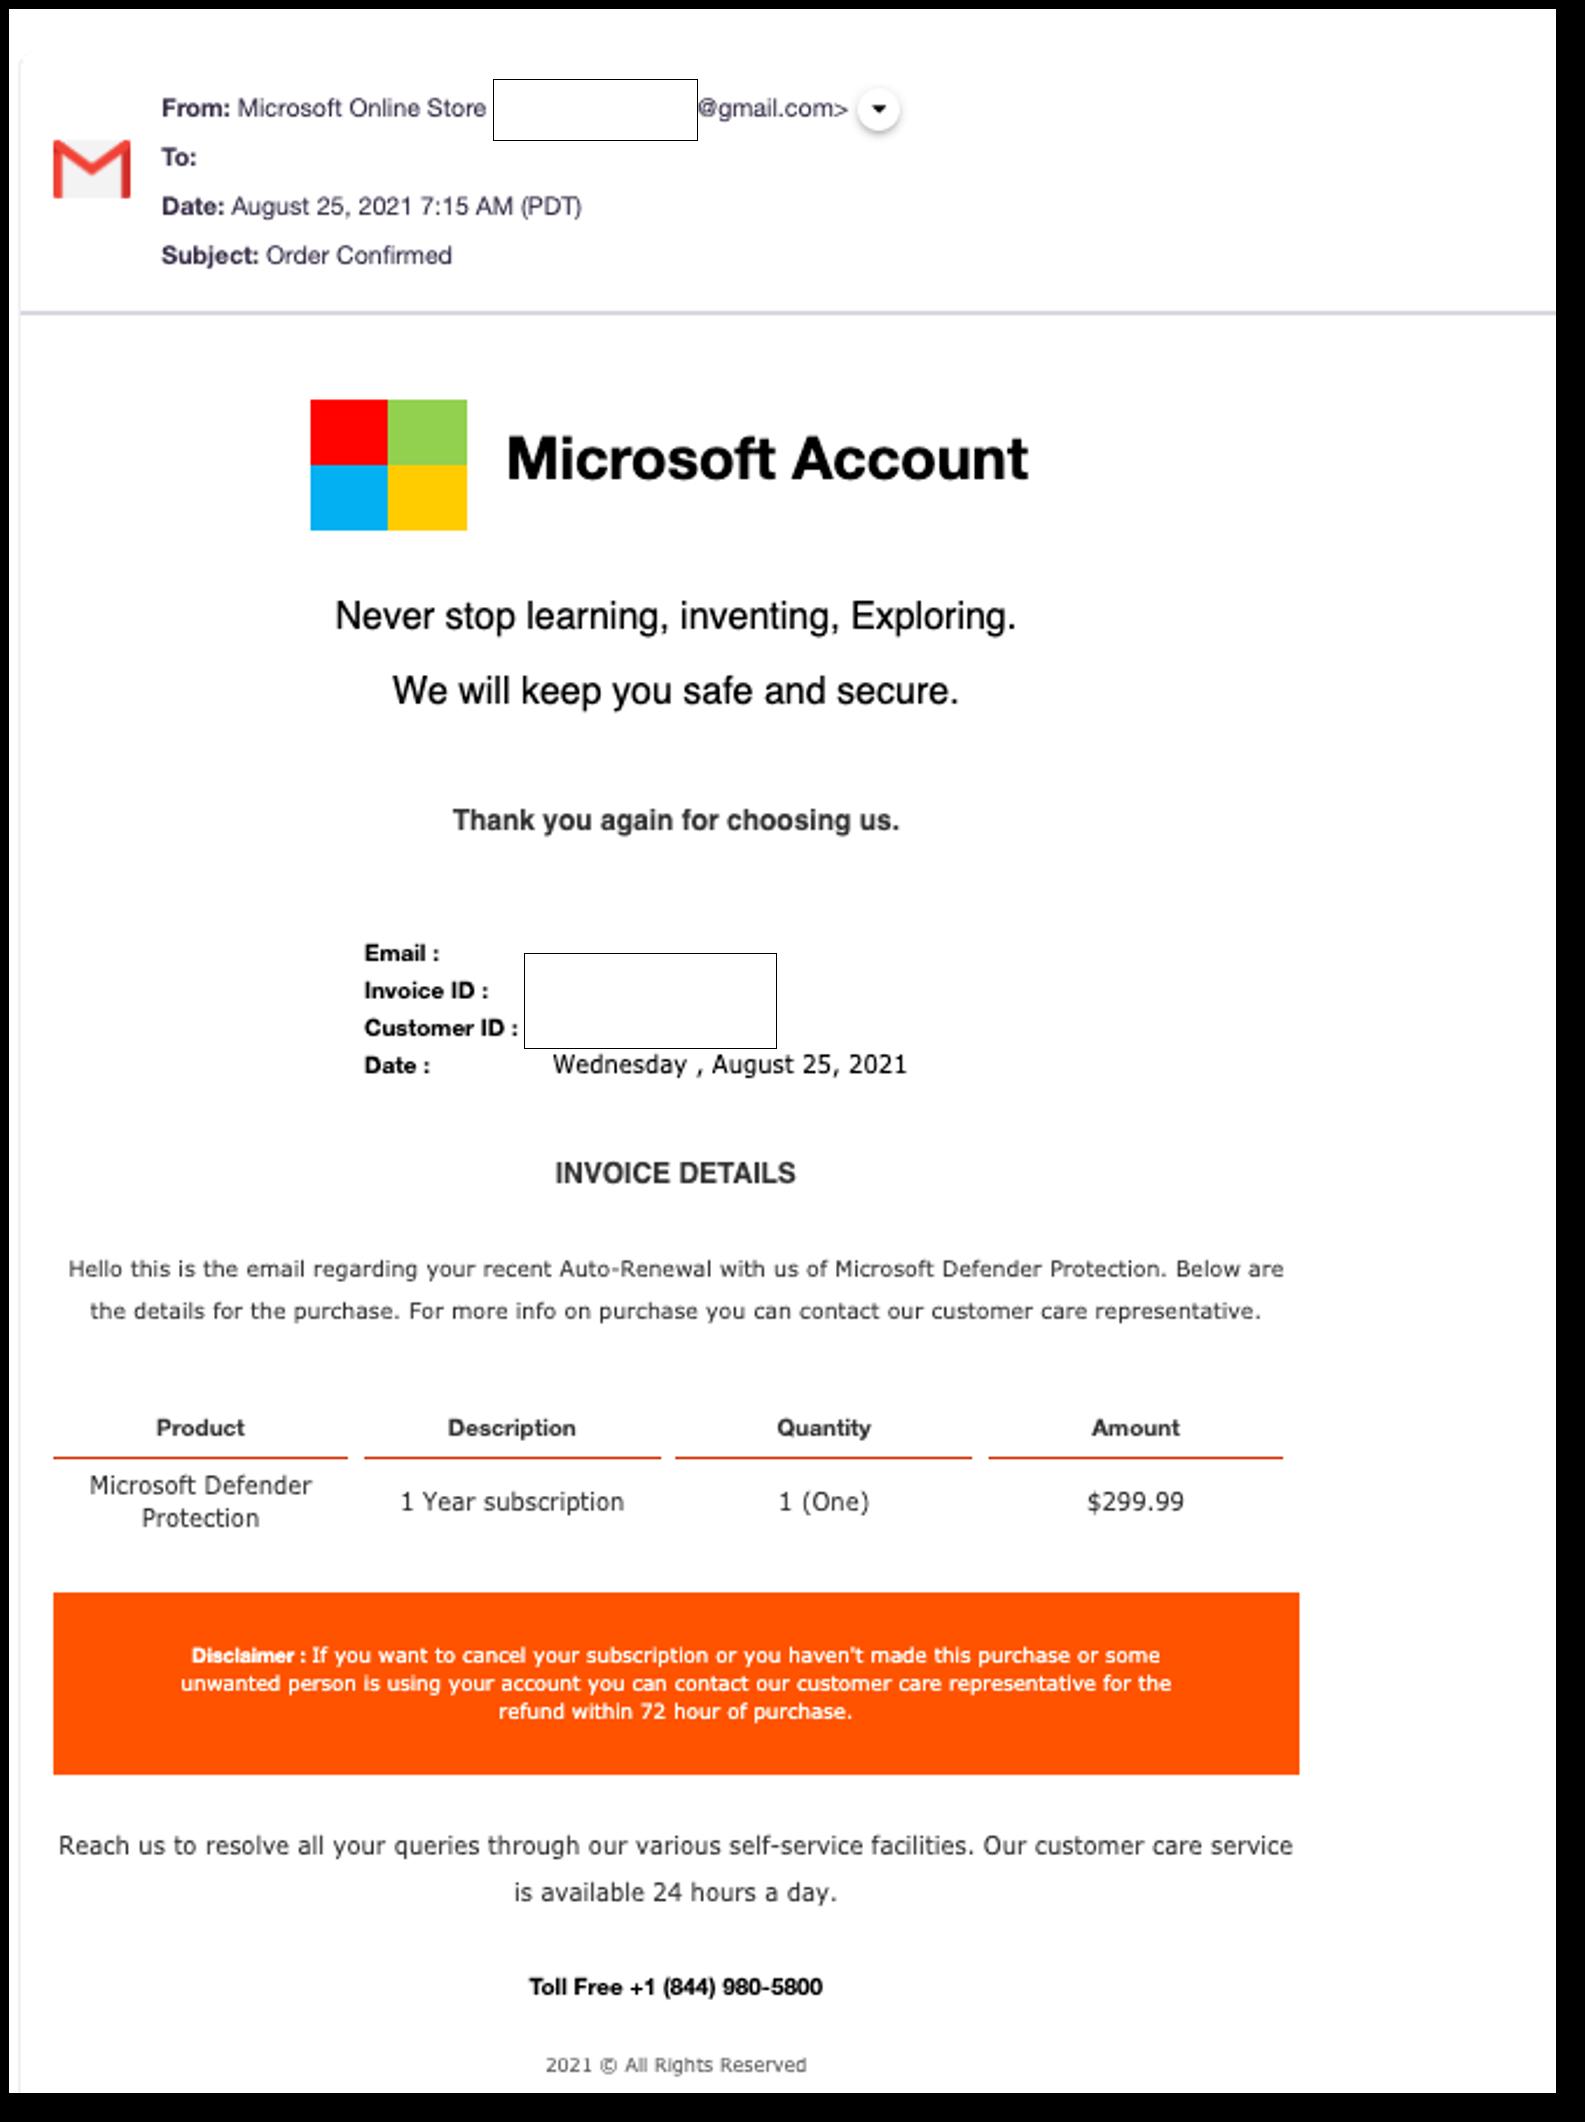 Microsoft Defender vishing email 2